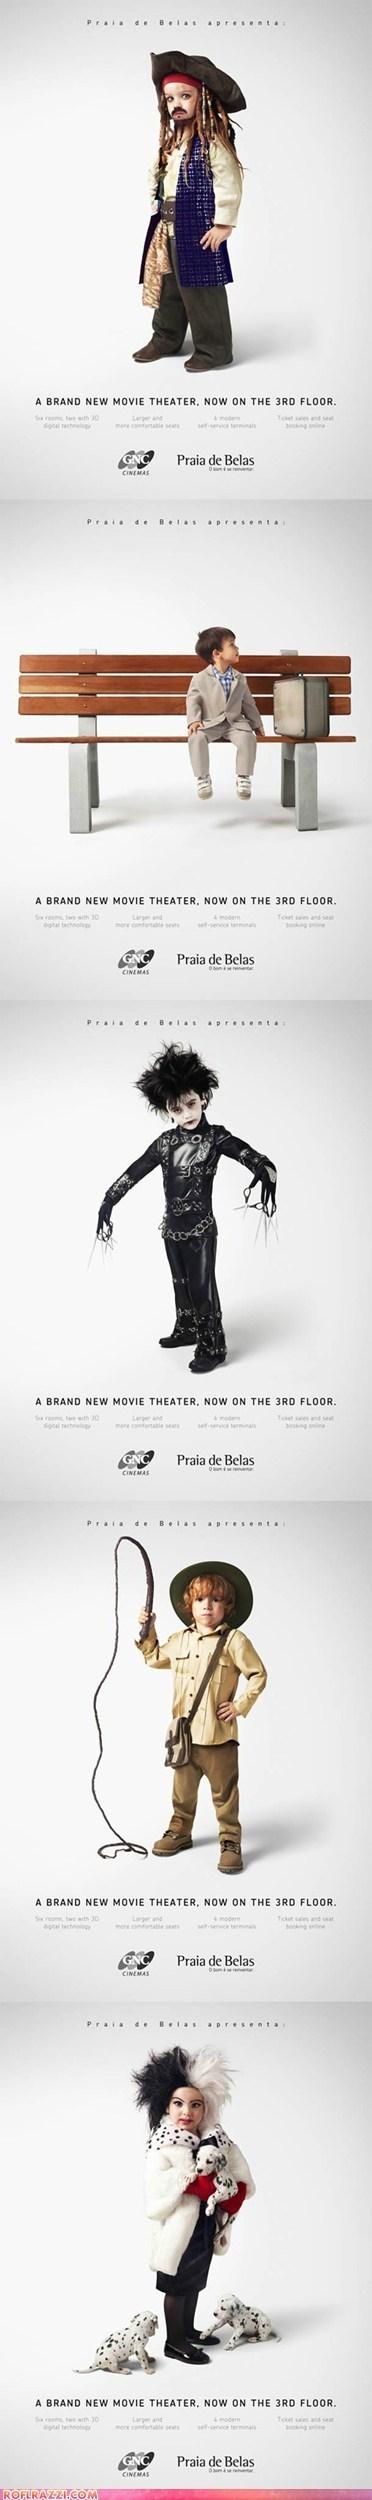 funny,kids,Movie,poster